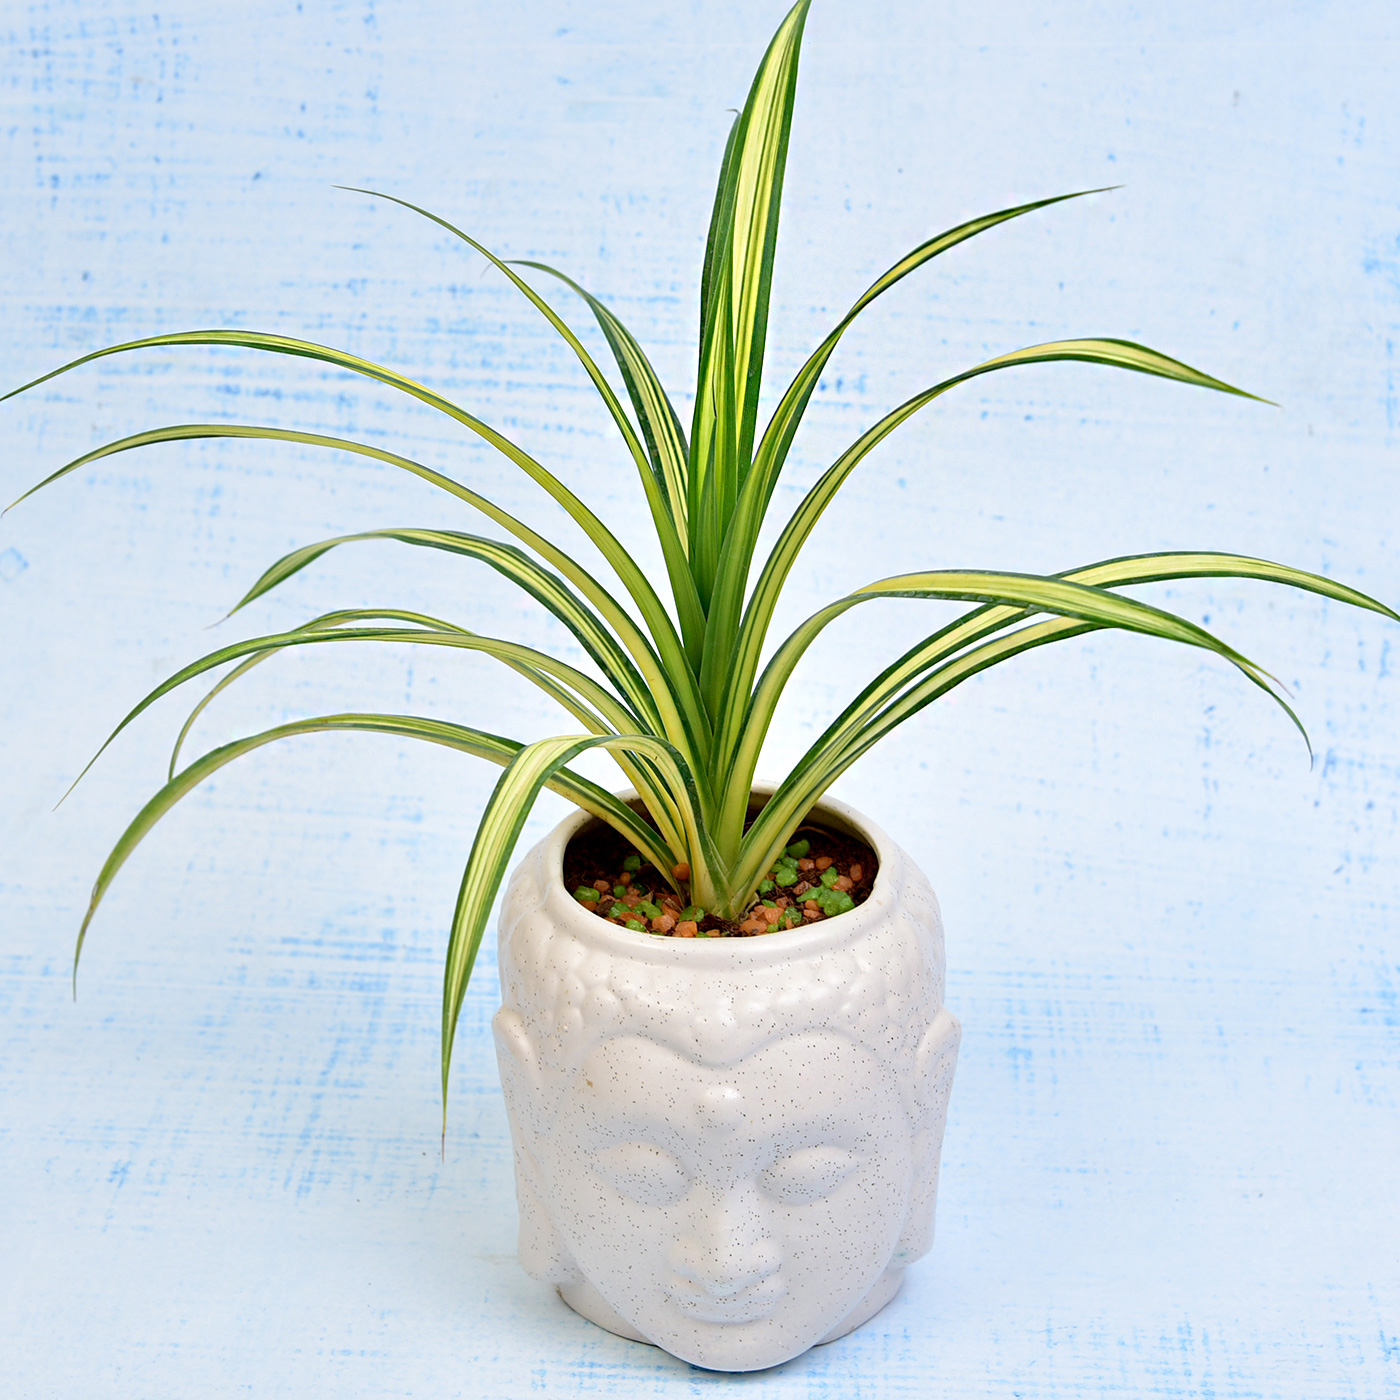 Vibrant Dracaena Pendulous Plant